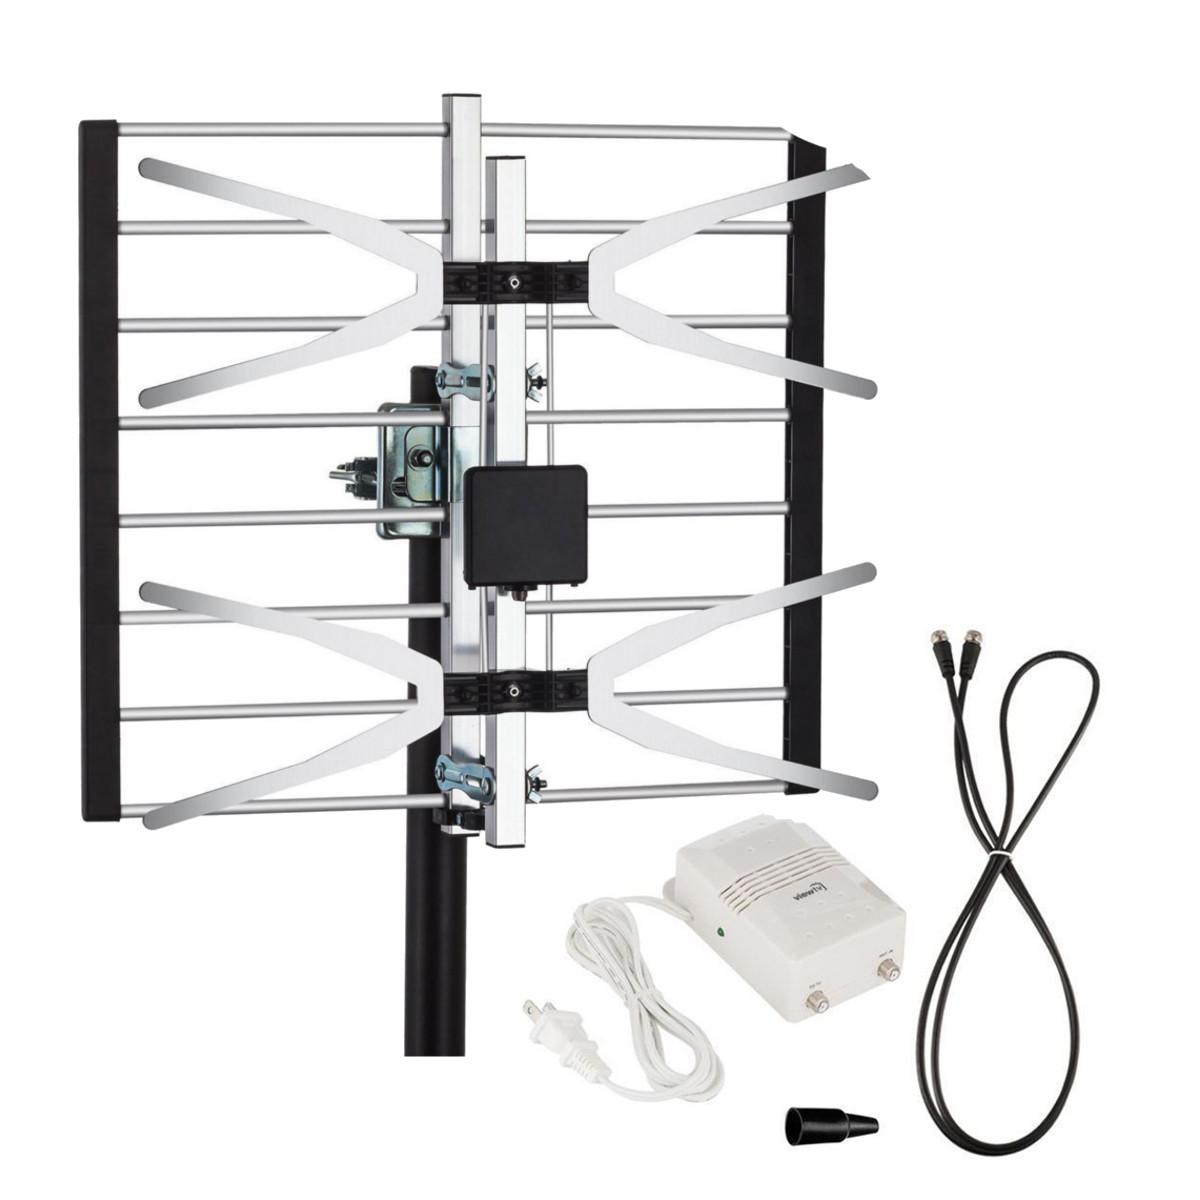 Yehfly TLPA16B 120 Miles Digital Amplified Signal TV Aerial Antenna